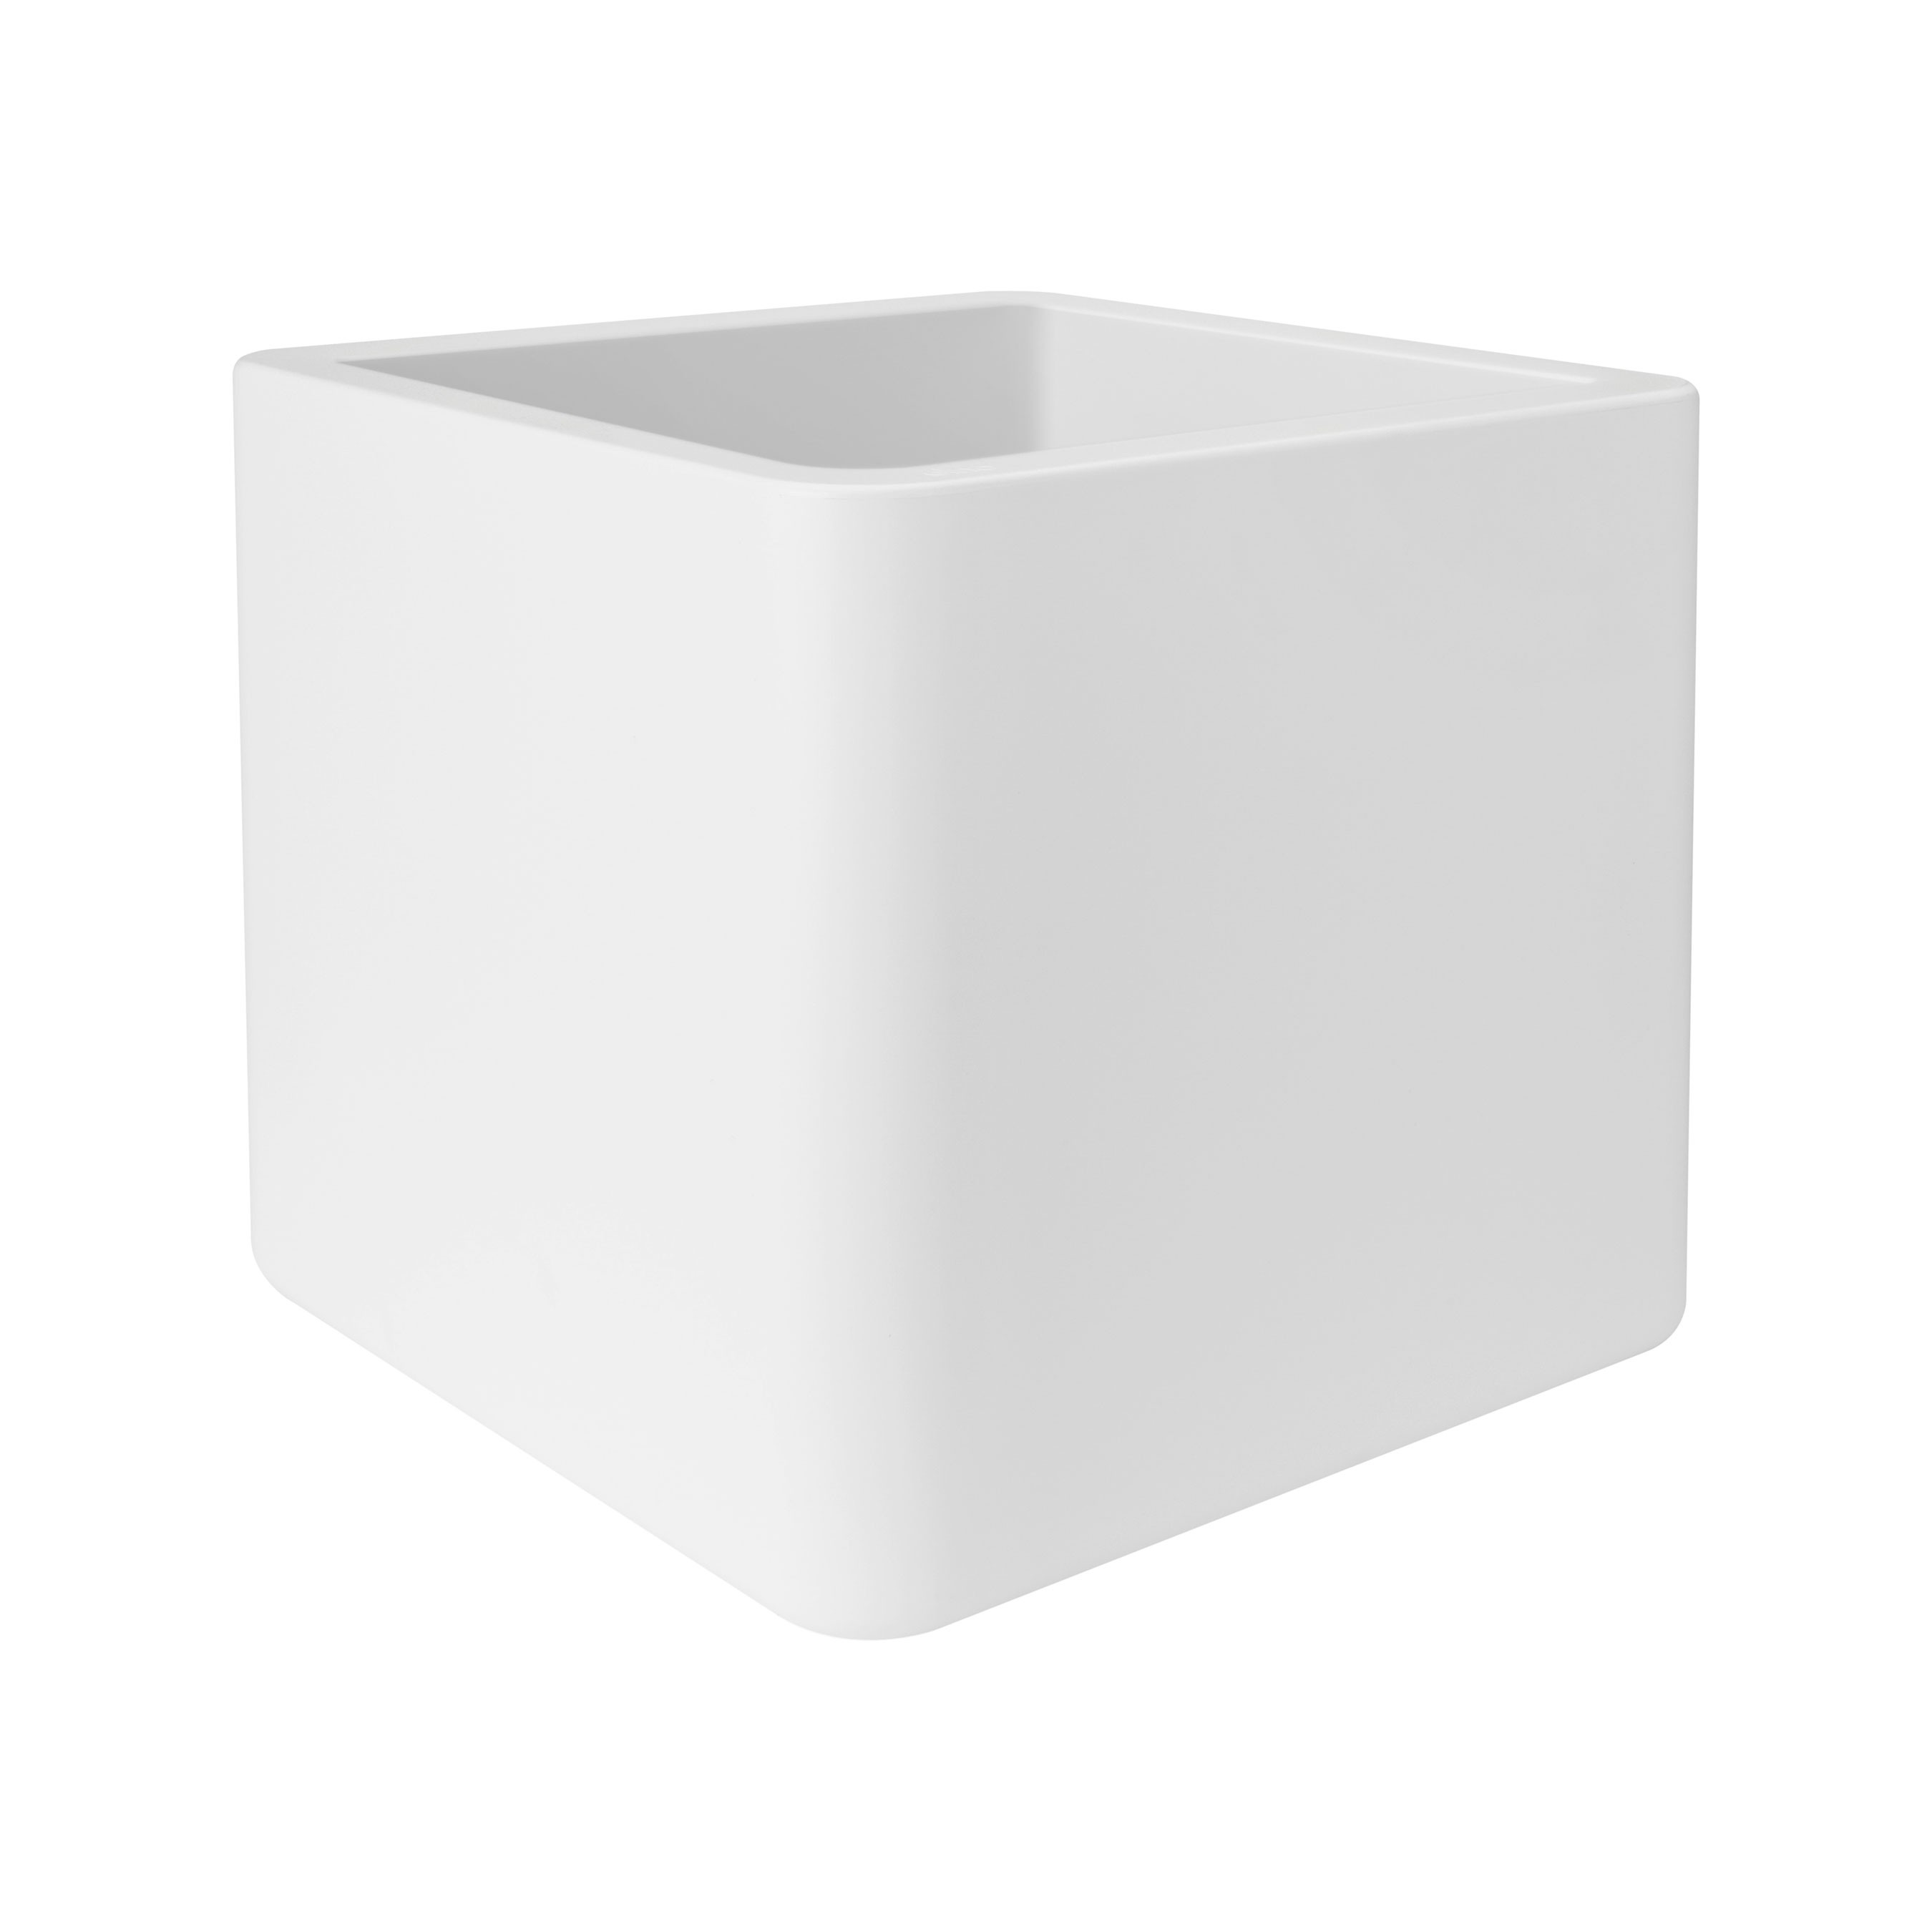 Pflanzgefäß / Pflanzkasten elho Pure Soft Brick 40x40x39cm weiß Bild 1